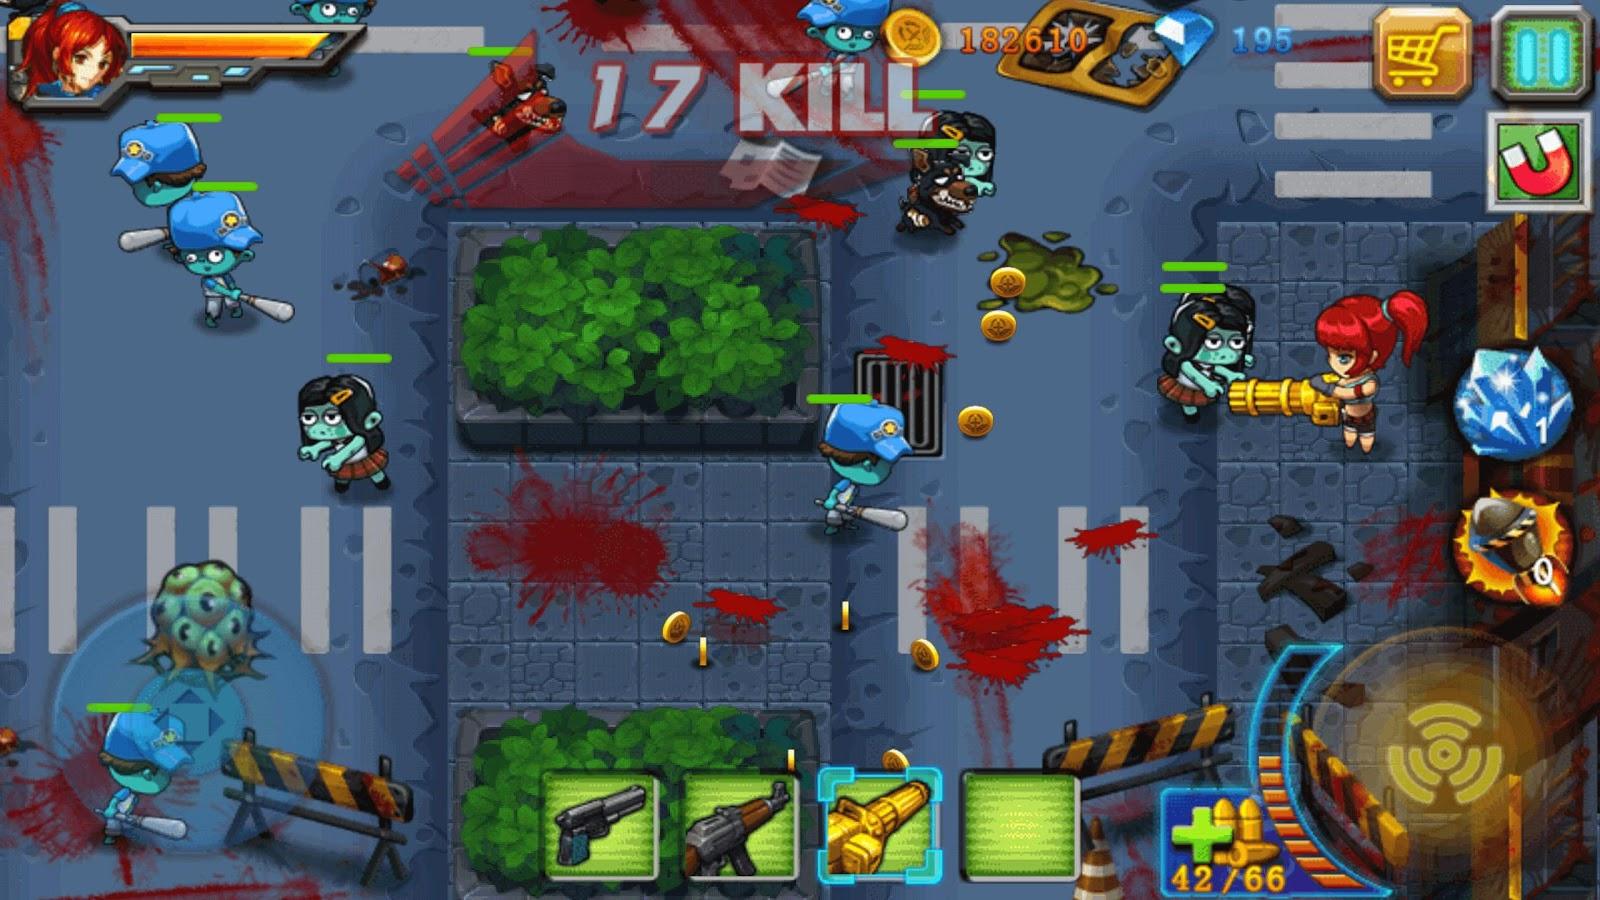 Zombie Killer - Hero vs Zombies 1 8 APK Download - Android